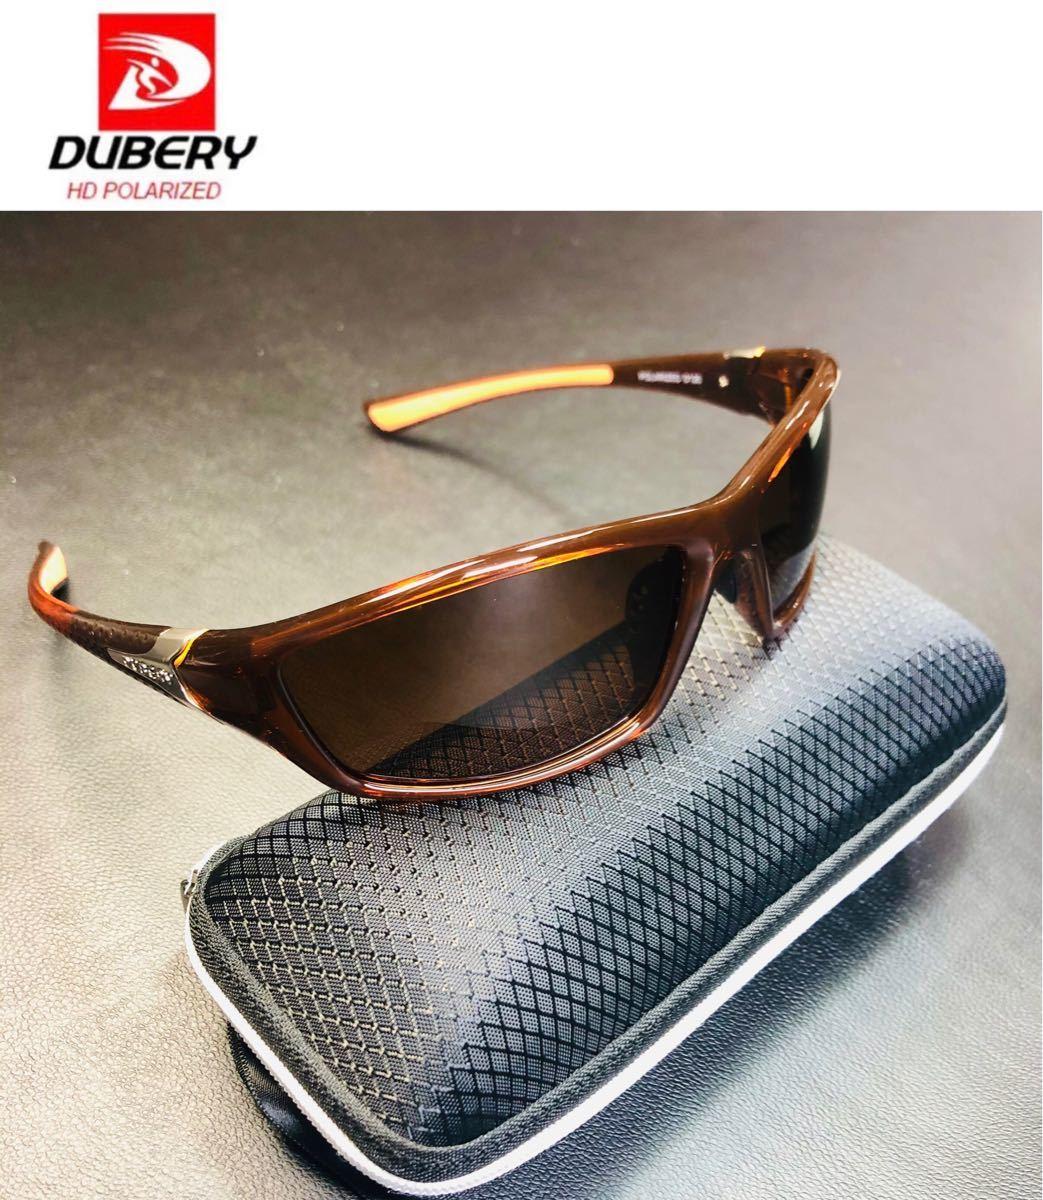 DUBERY サングラス 偏光グラス UV400 軽量 車  釣り アウトドア スポーツサングラス 偏光サングラス 超軽量